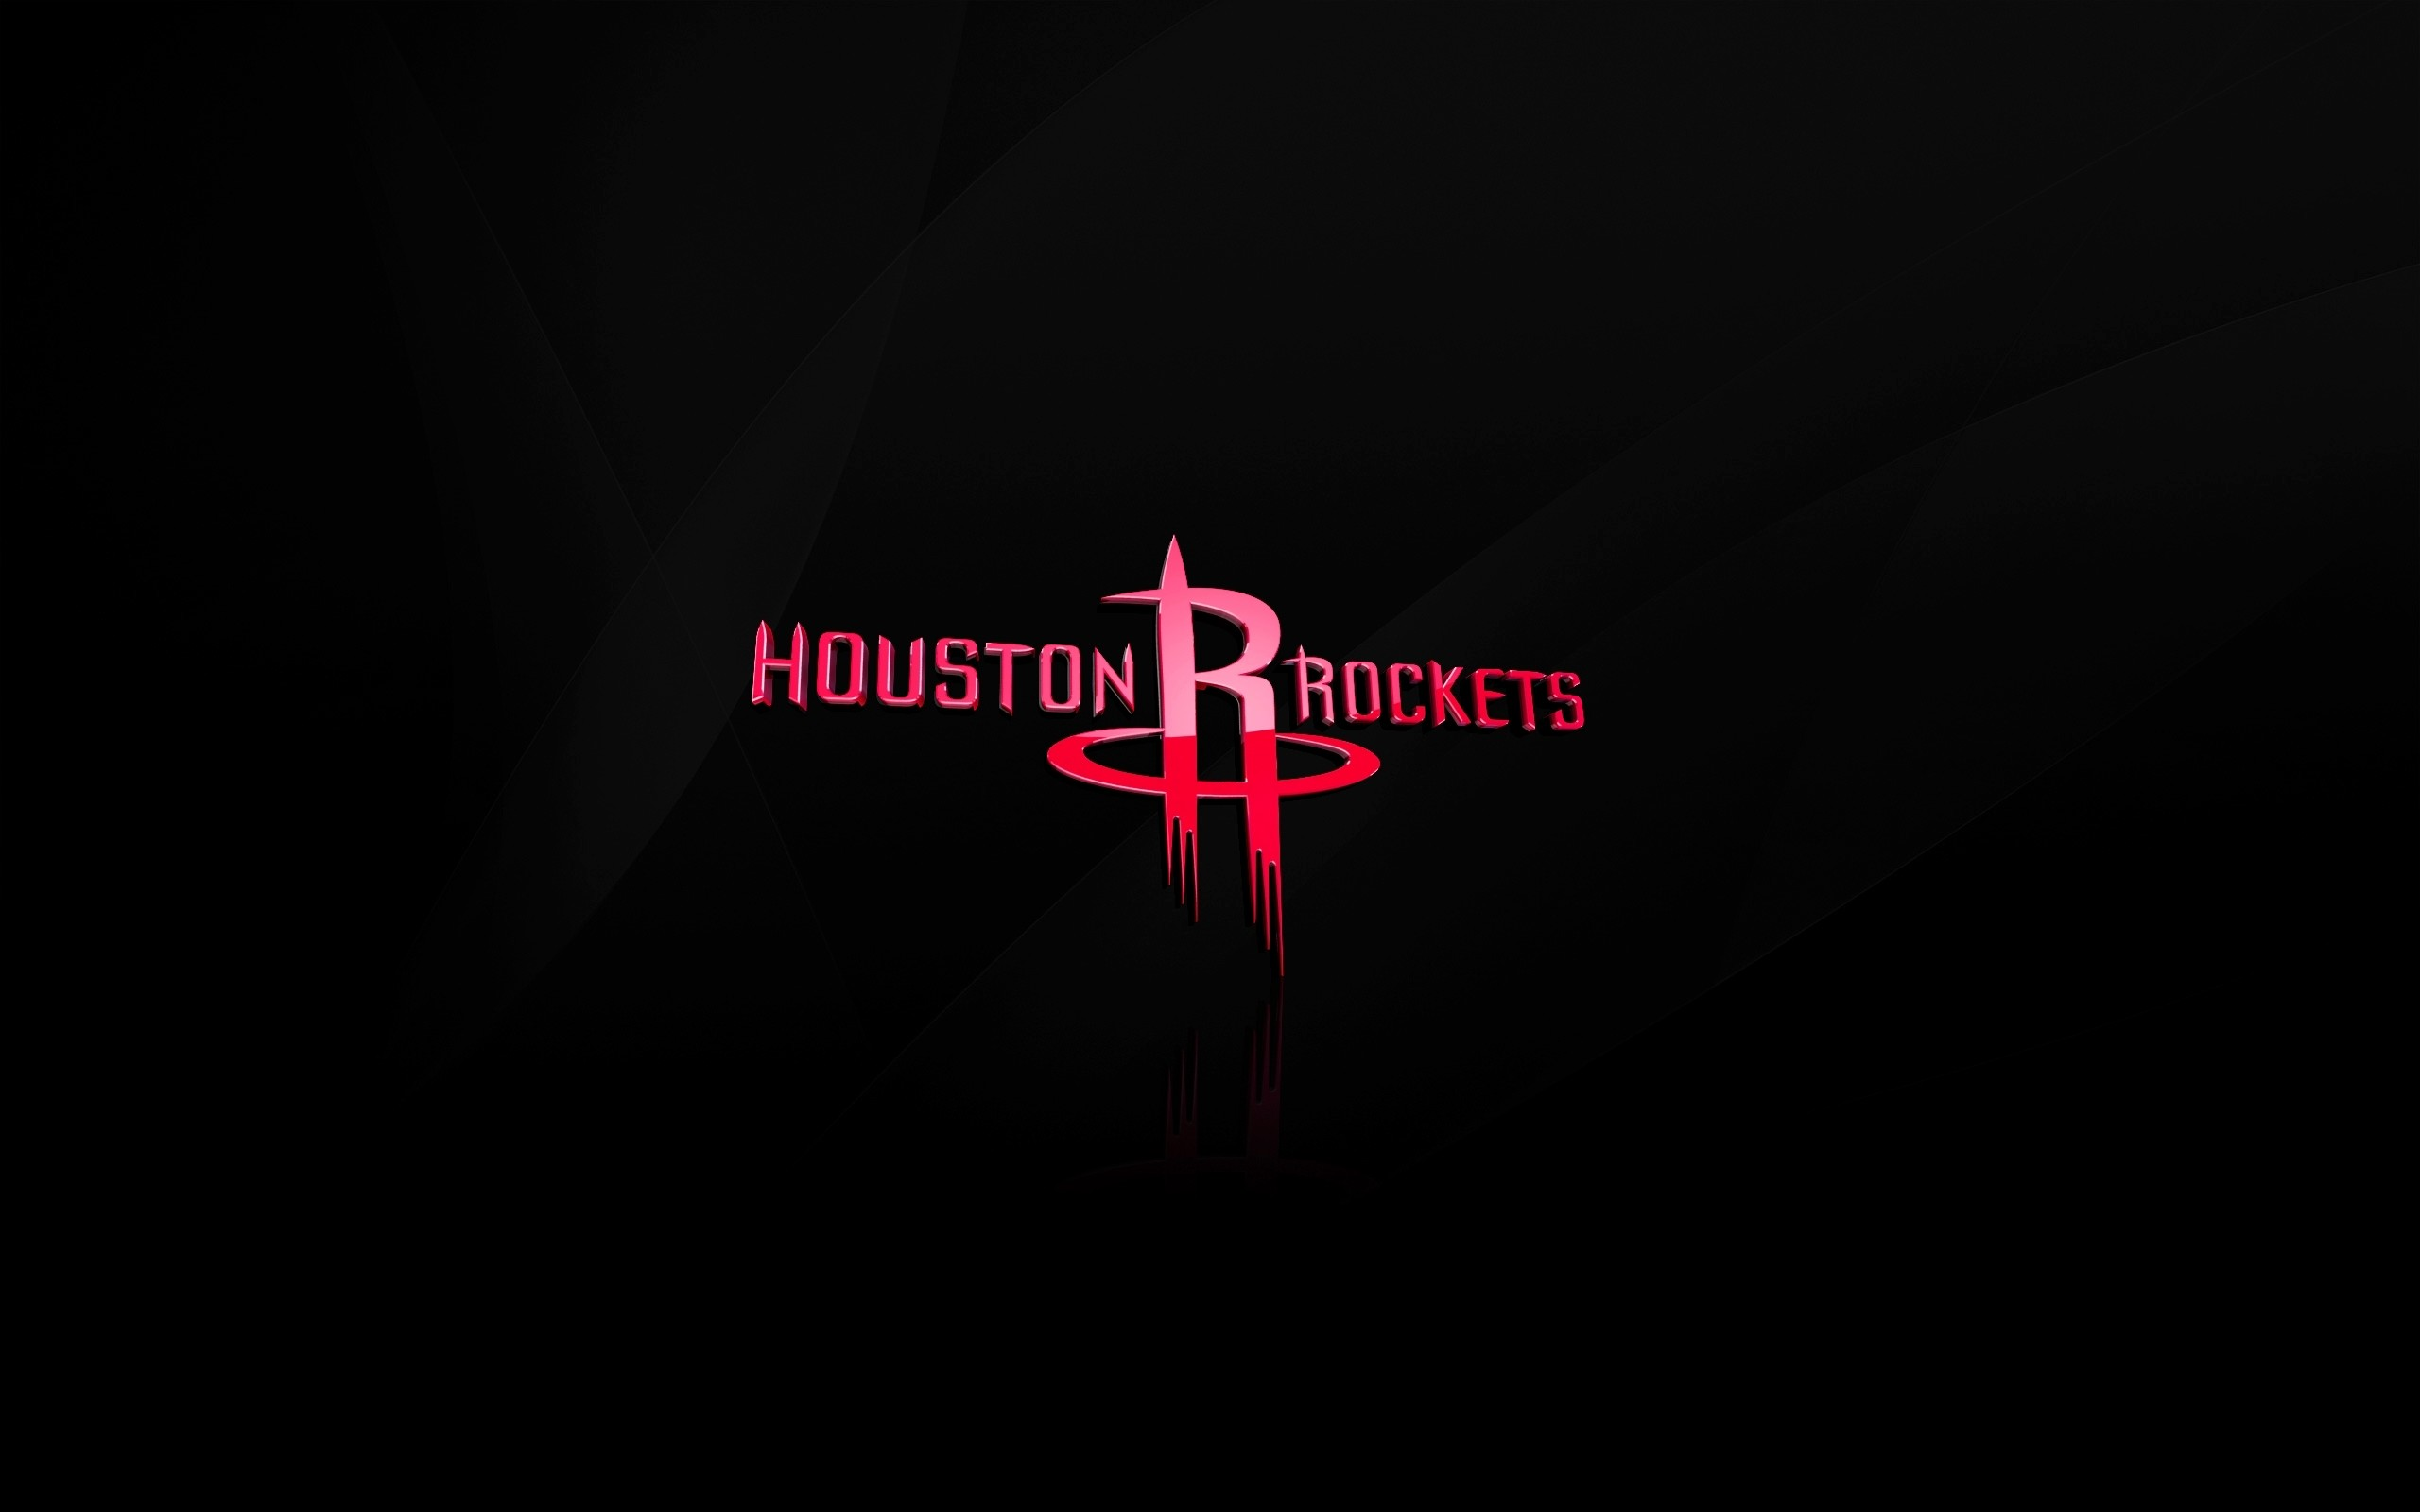 Houston Rockets Wallpaper HD | TopPicture.XYZ